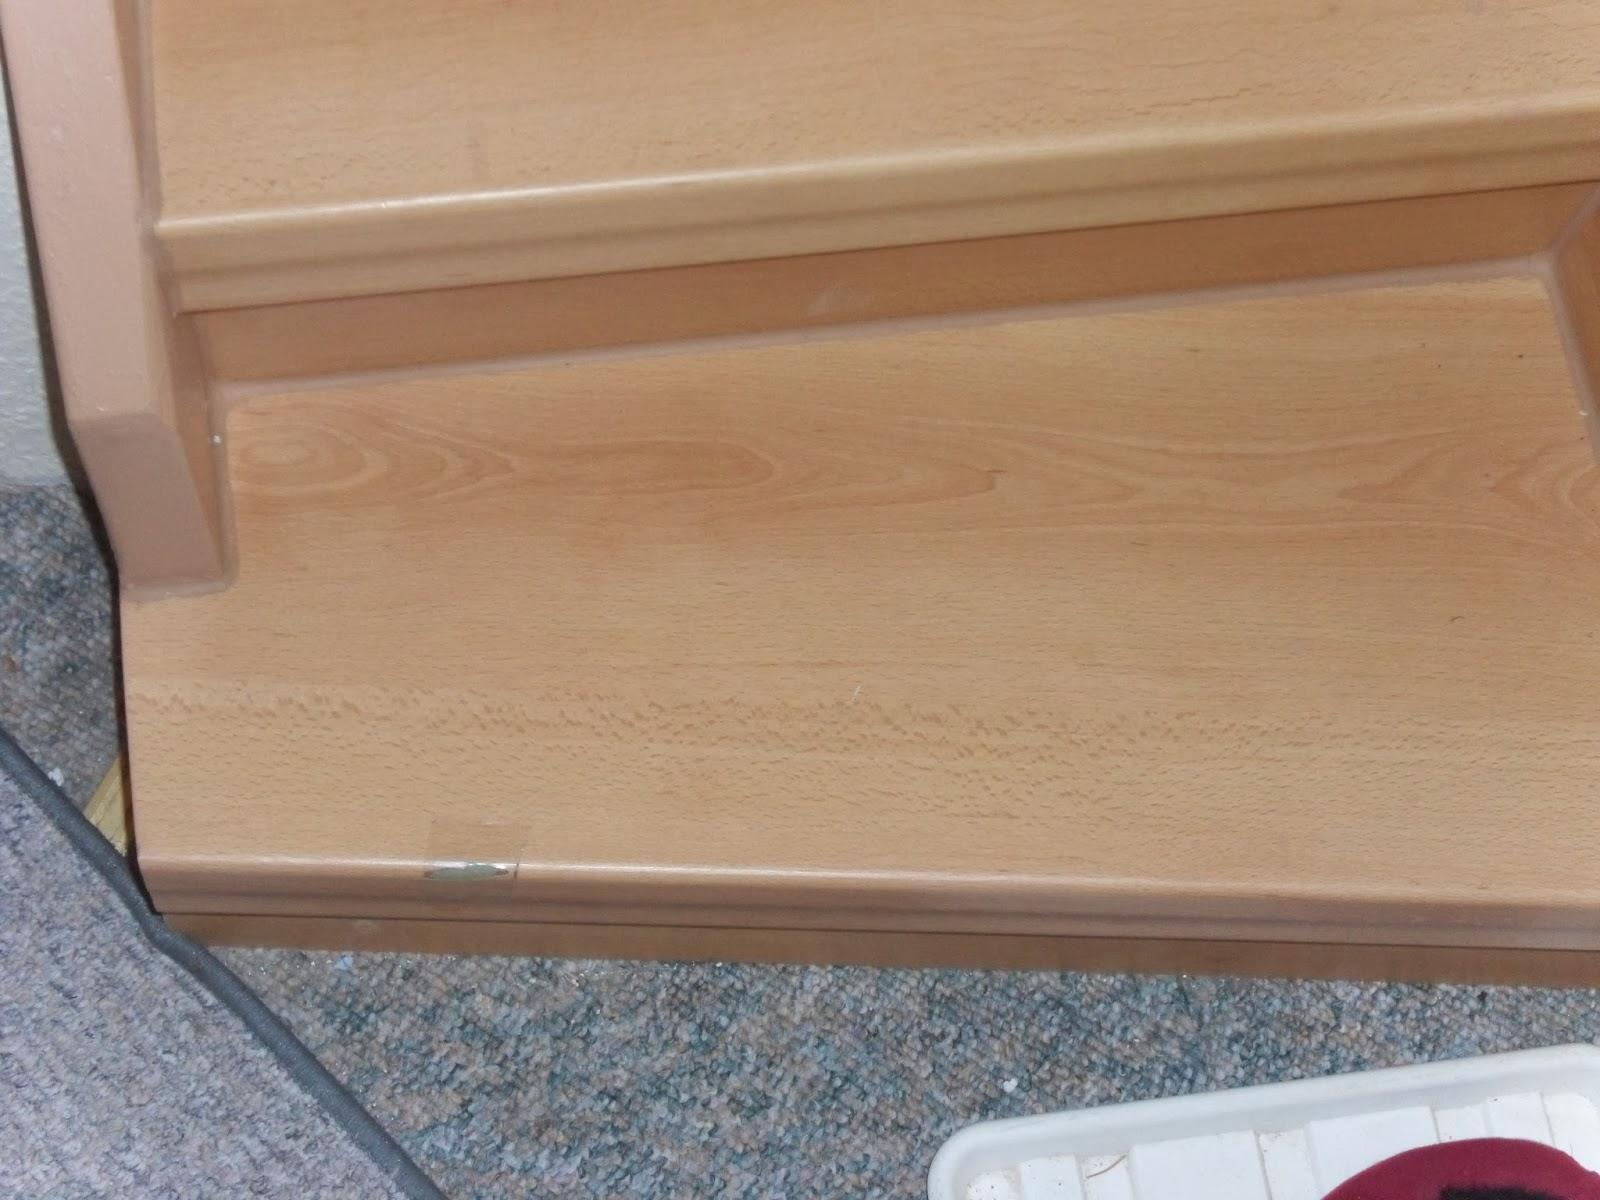 beschädigte Treppenkante - Antritts-Stufe